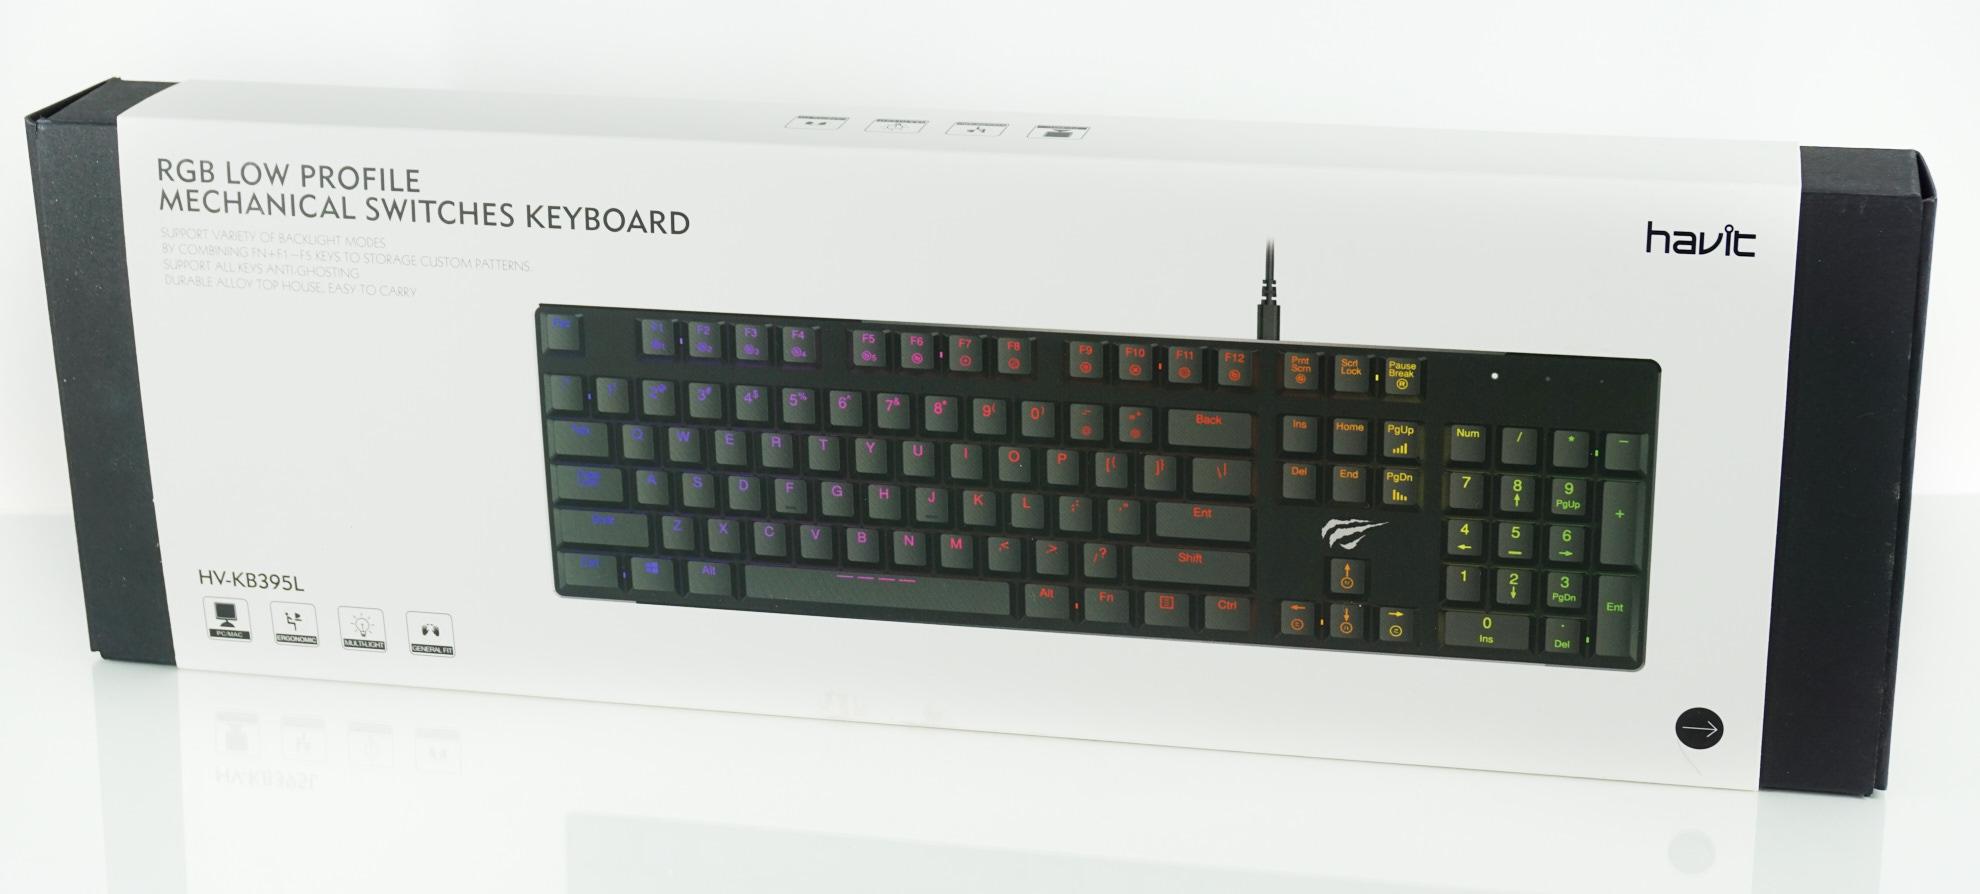 26c73c97b1a The HAVIT KB395L RGB Mechanical Keyboard Review: Marvelous ...